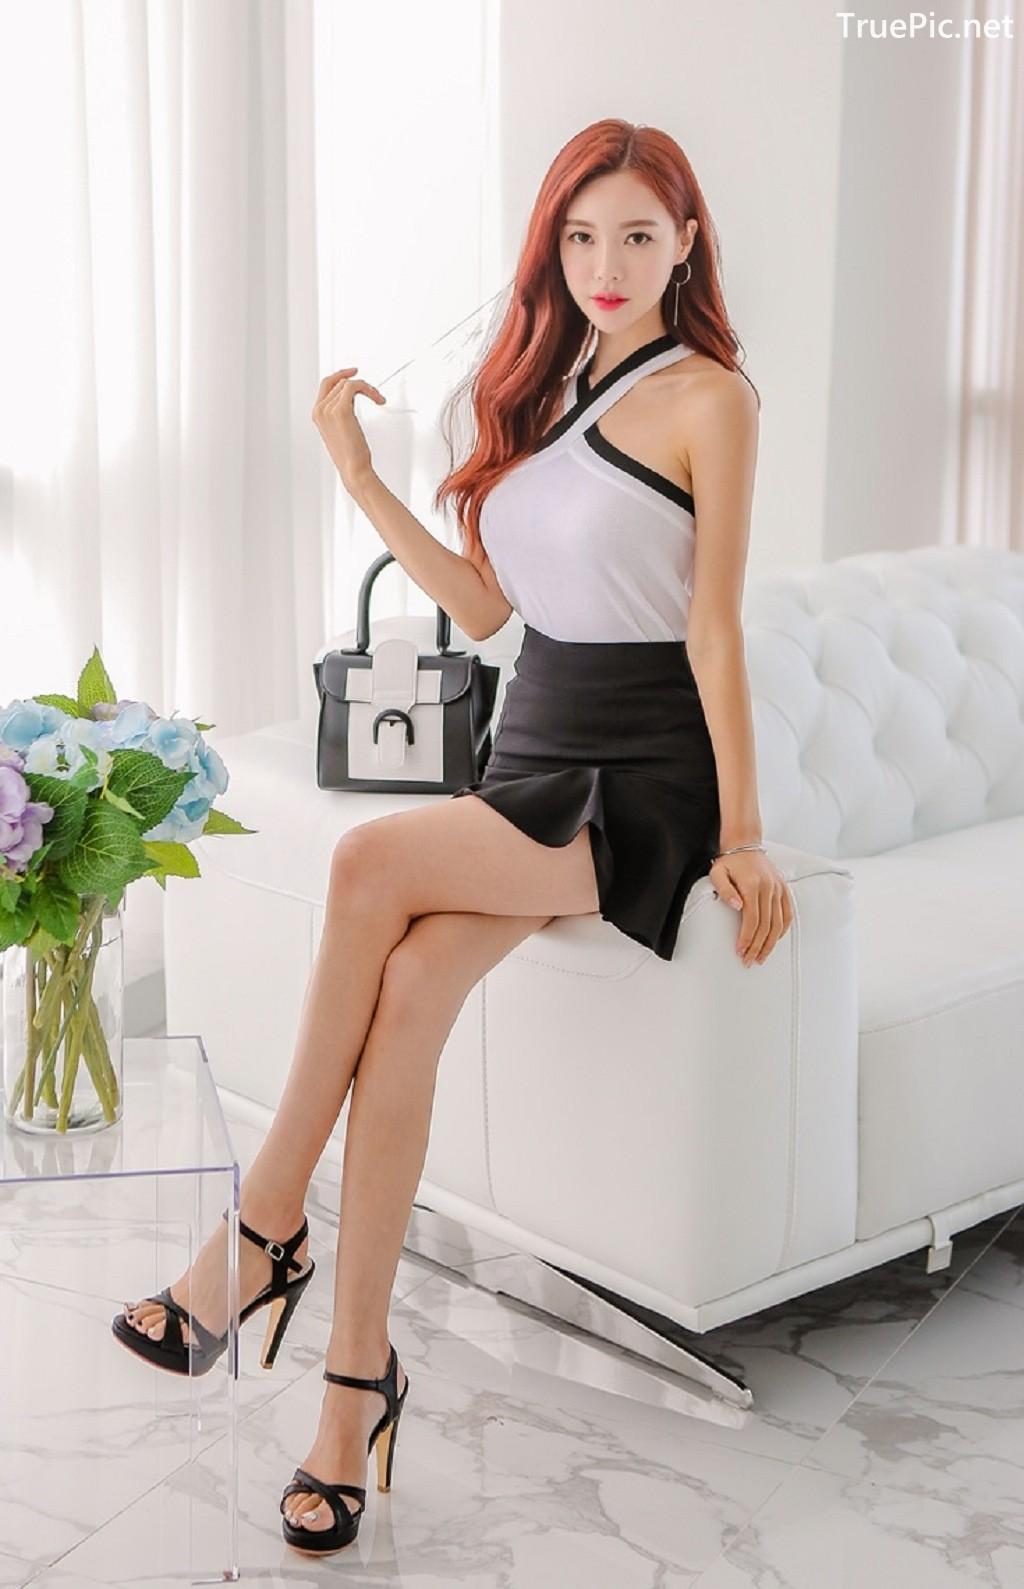 Image-Korean-Fashion-Model-Hyemi-Korean-Outfits-Fashion-TruePic.net- Picture-8